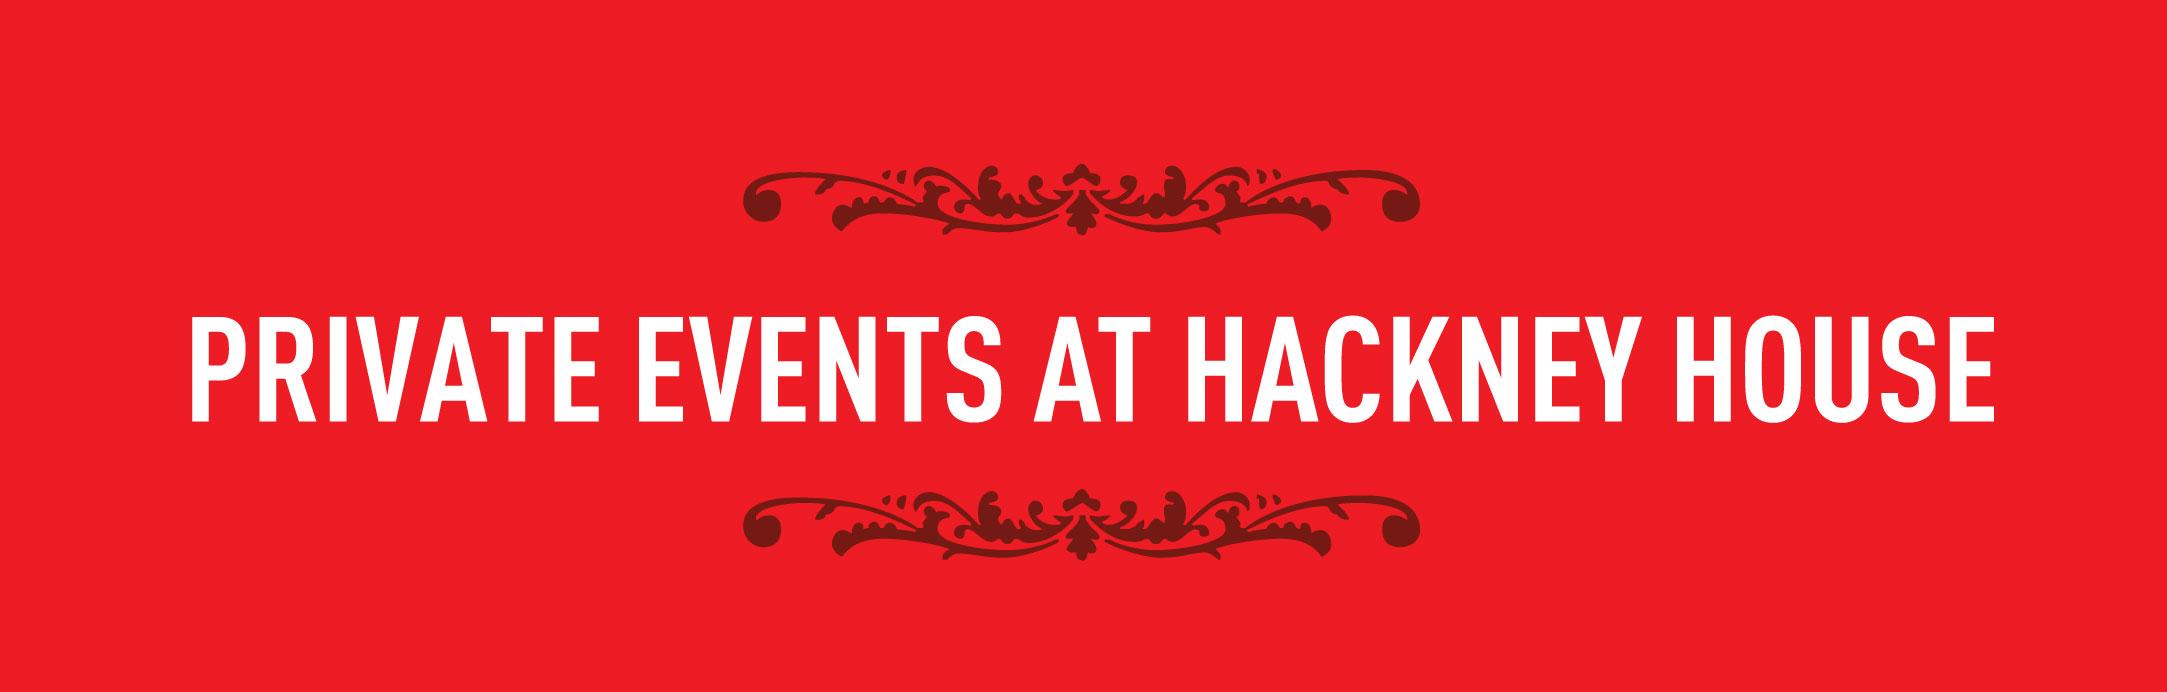 Events-at-HH-header-website.jpg